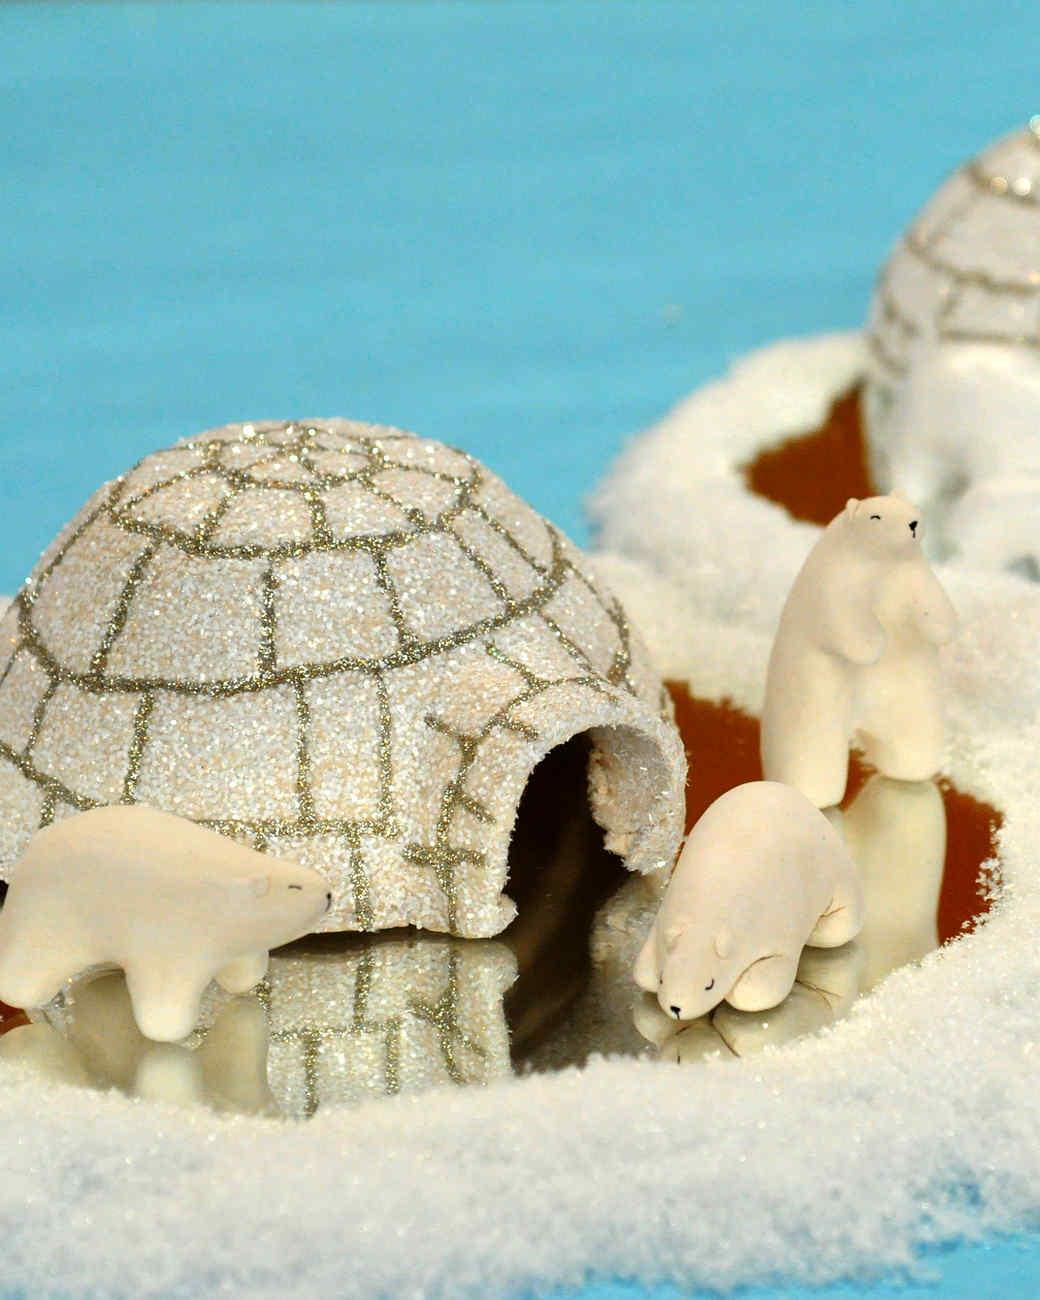 homemade-igloo-2-mslb7063.jpg